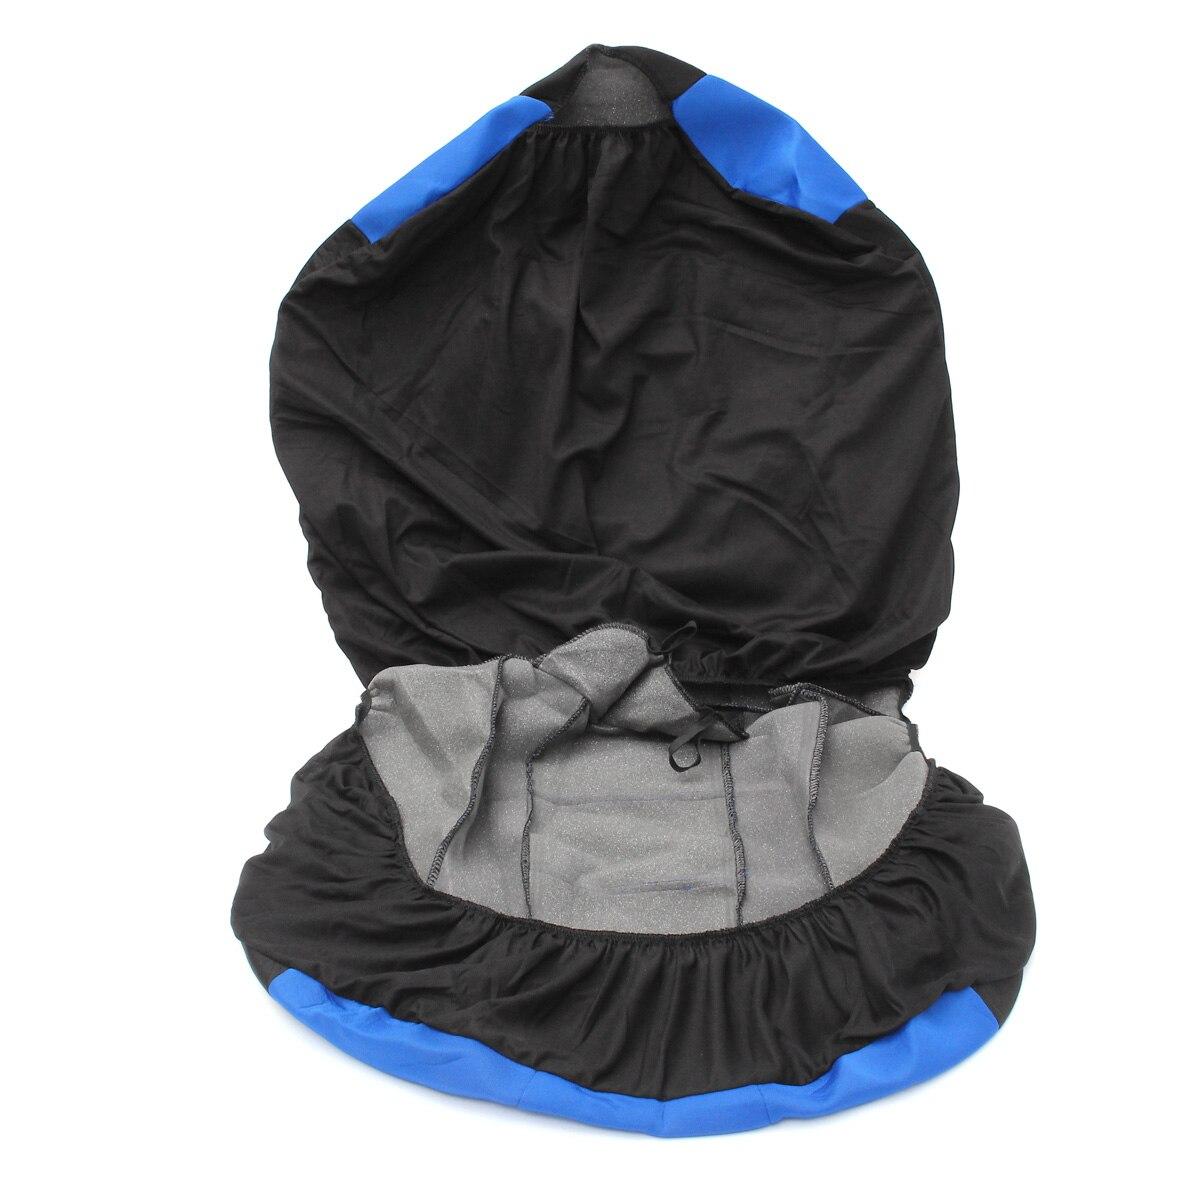 Four Seasons Universal Blue Black Car Seat Covers Front Rear Protectors 9 Piece Set Washable Automobiles Seat Cover